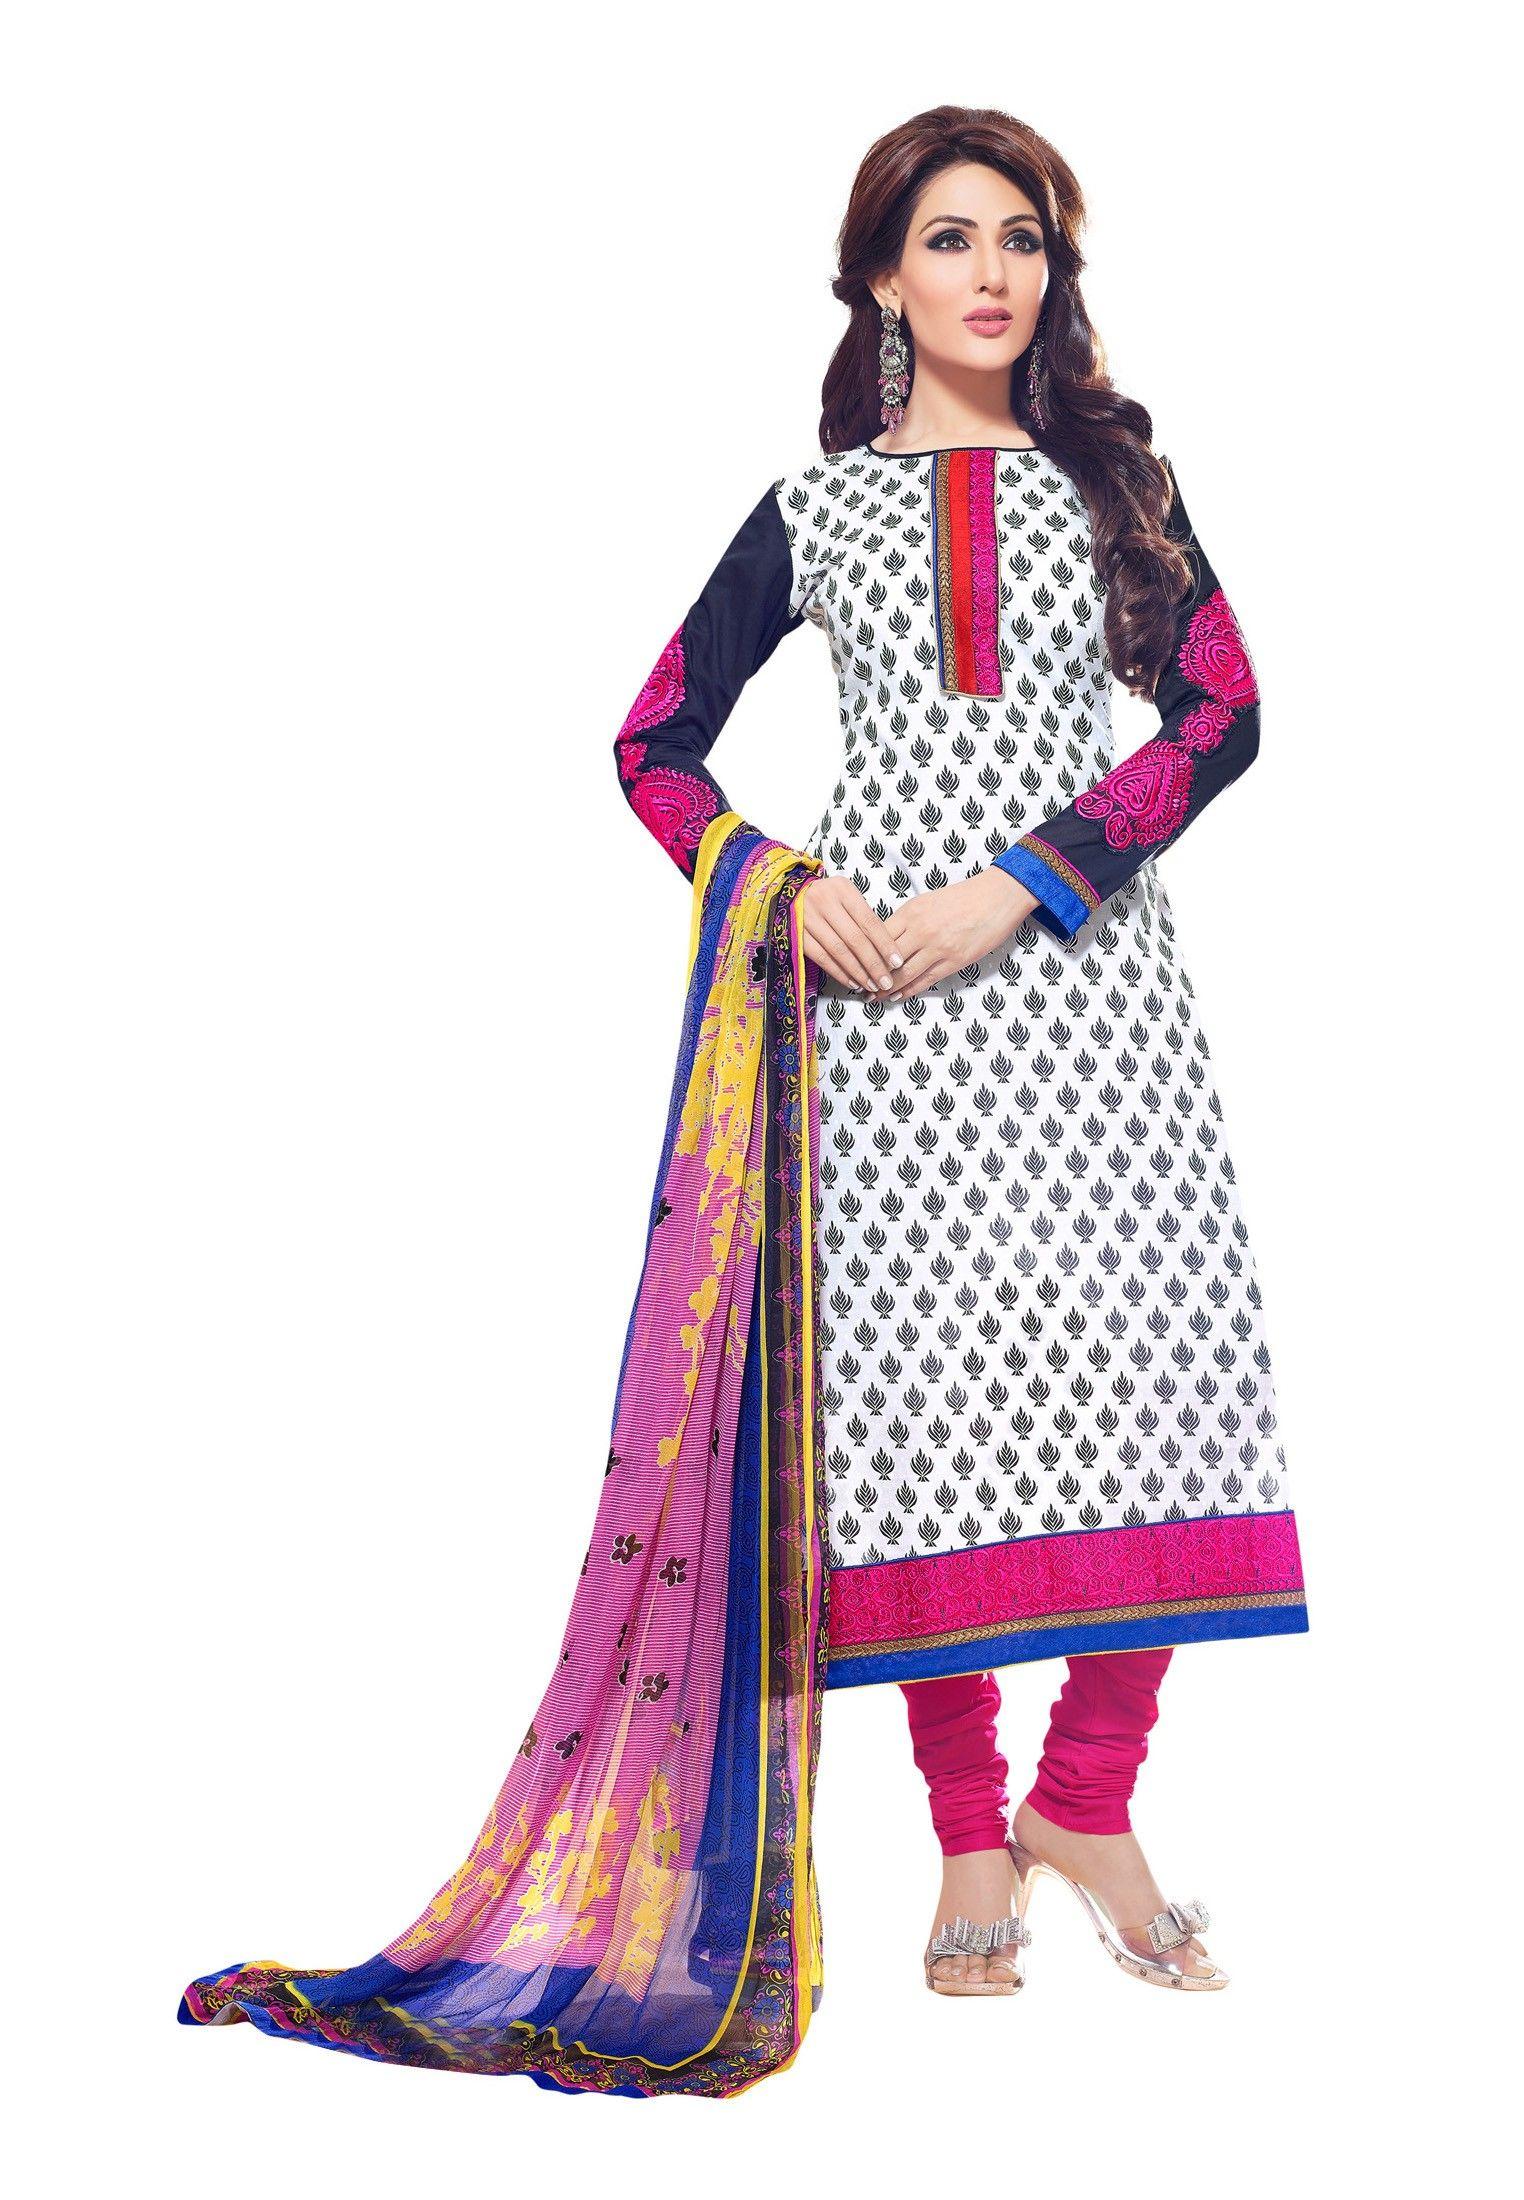 fc431cdccb White Geometric Print Cotton #Salwar Kameez | Modern Ethnic Wear ...